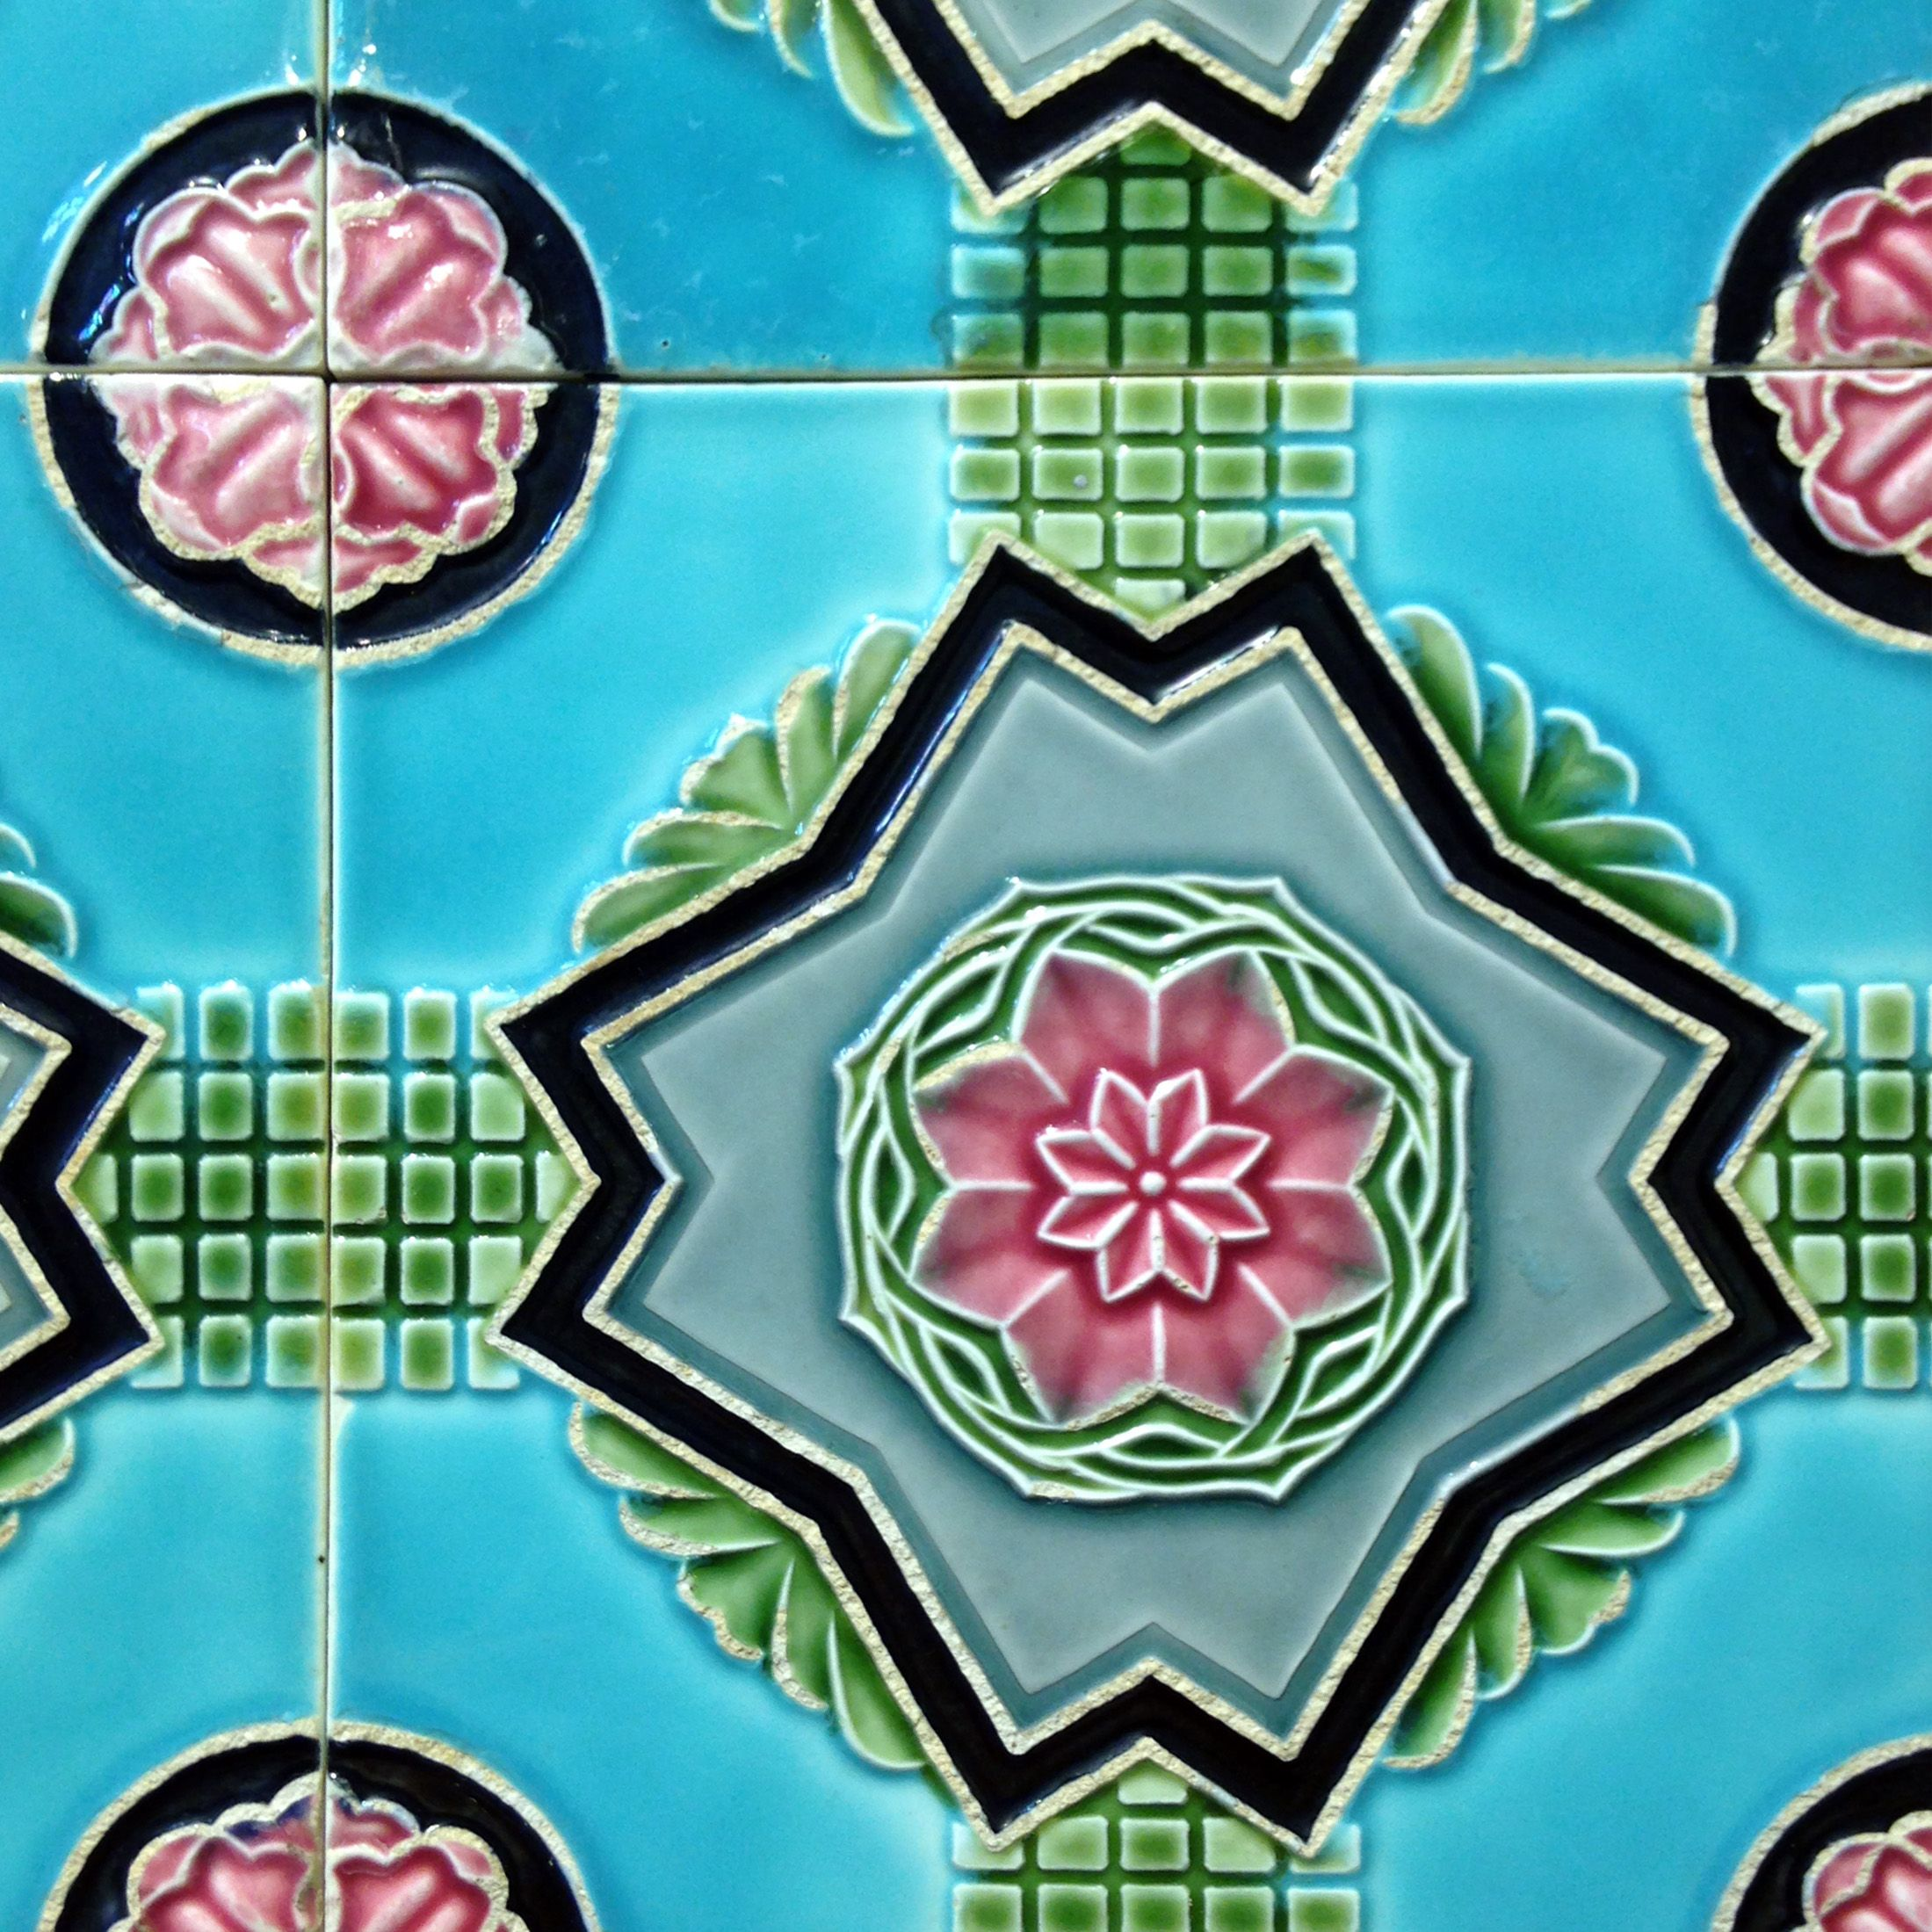 Good Retro Tile Art Abstract Artwork Retro